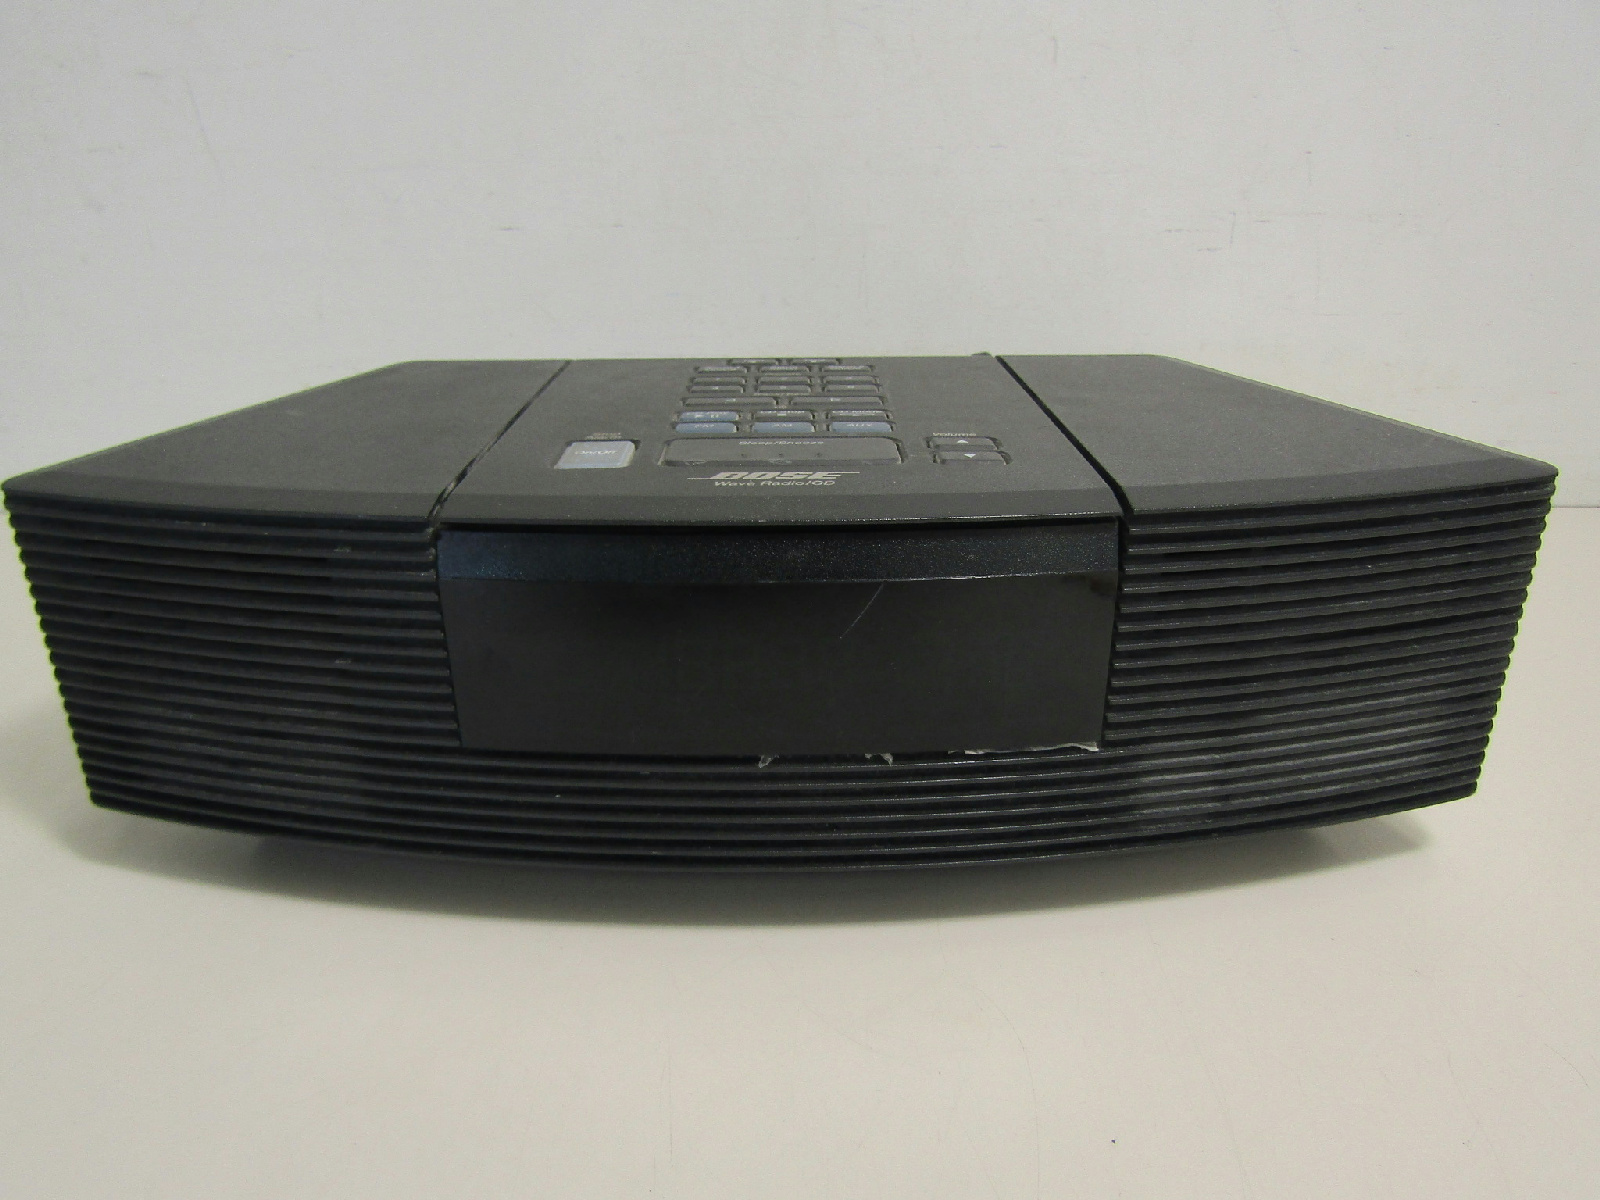 bose wave black radio cd player alarm clock awrc 1g ebay. Black Bedroom Furniture Sets. Home Design Ideas